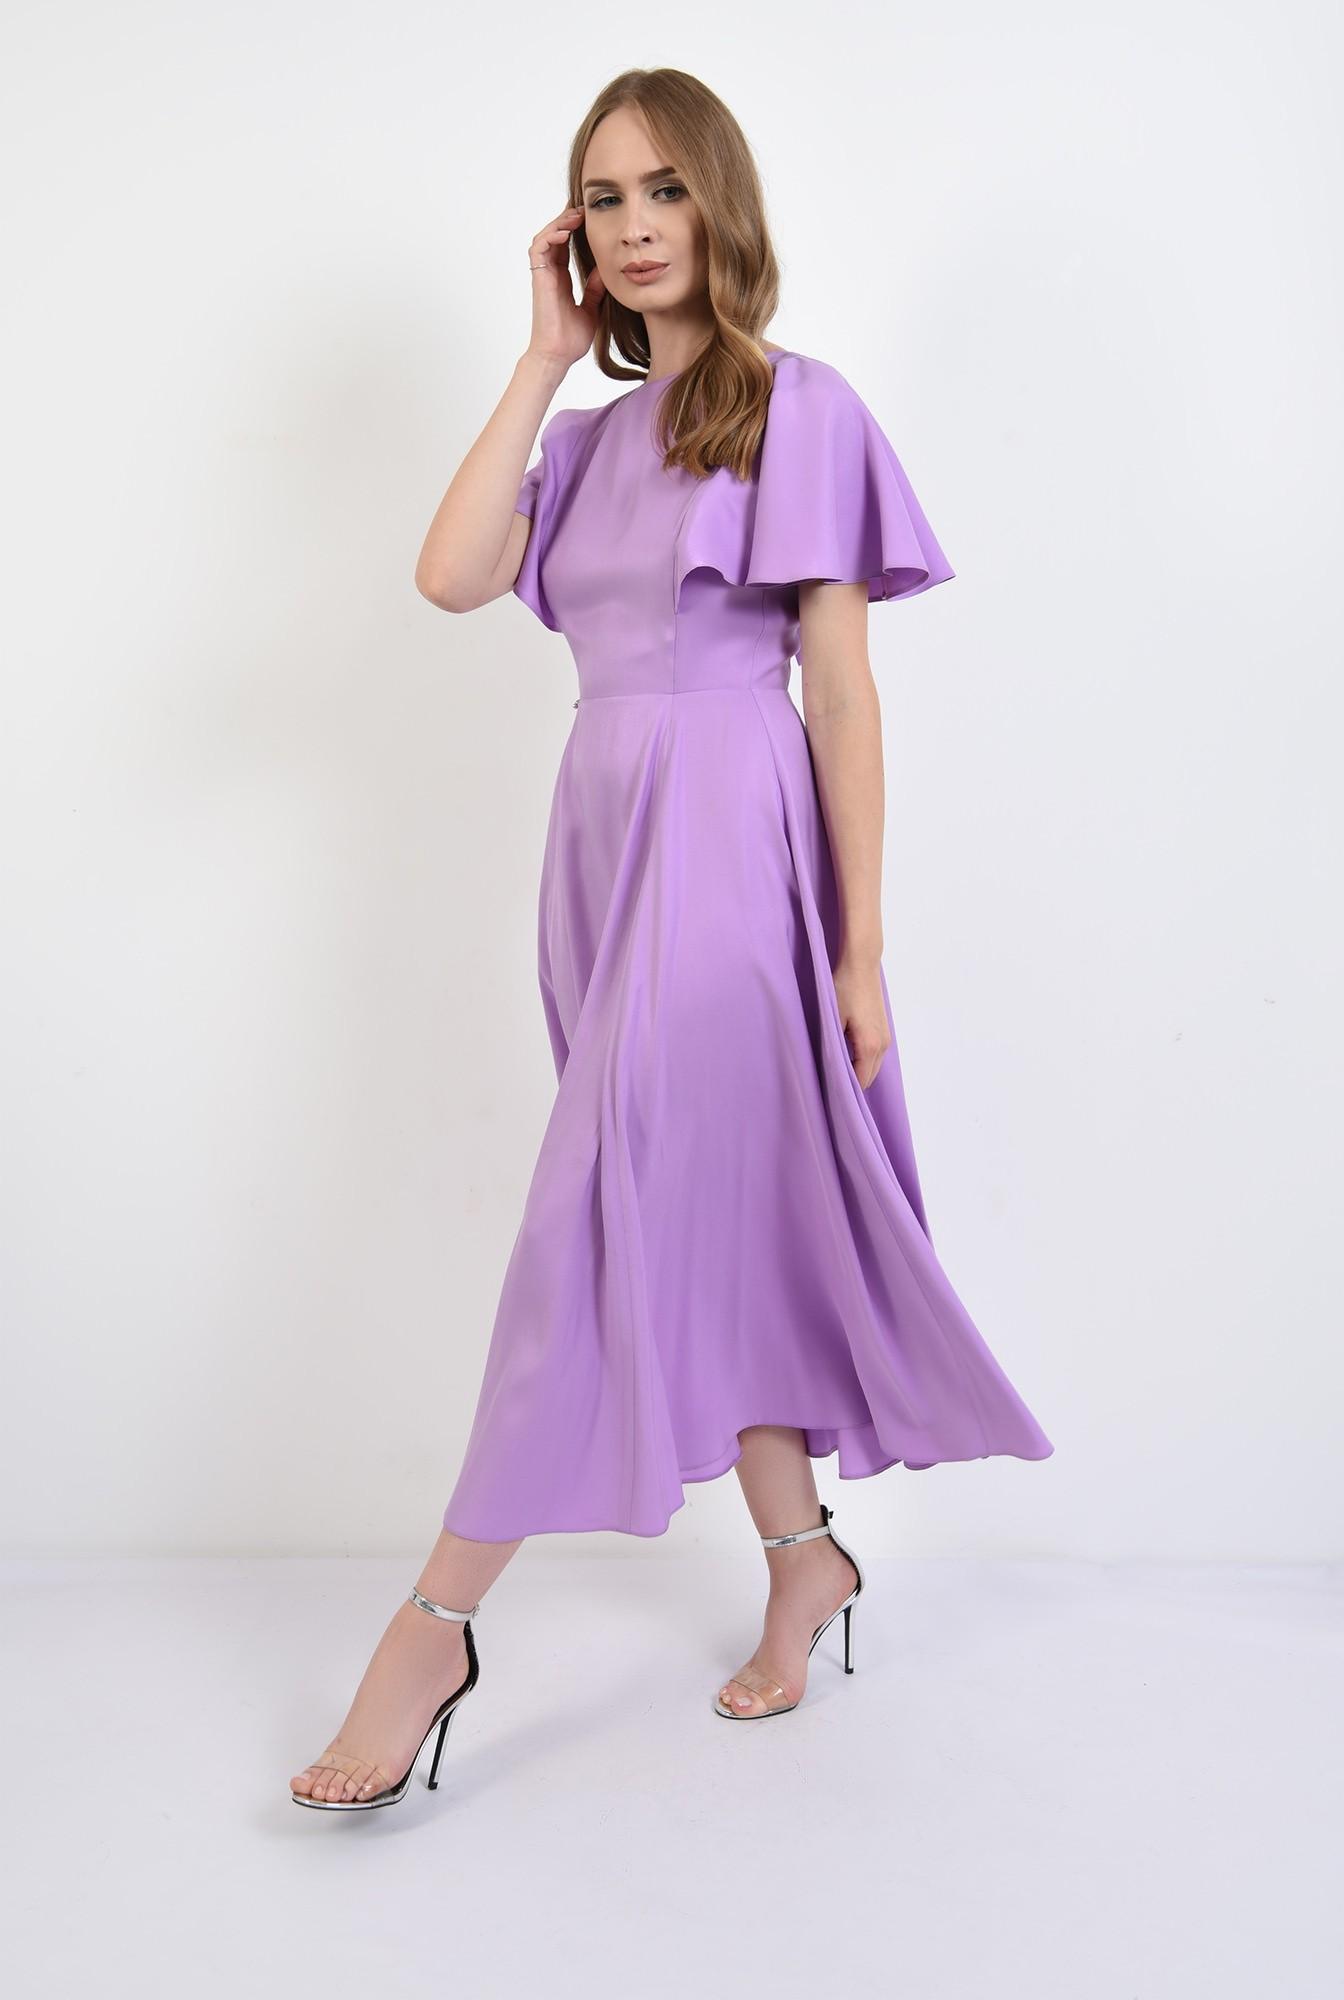 0 - 360 - rochie eleganta, midi, lila, Poema